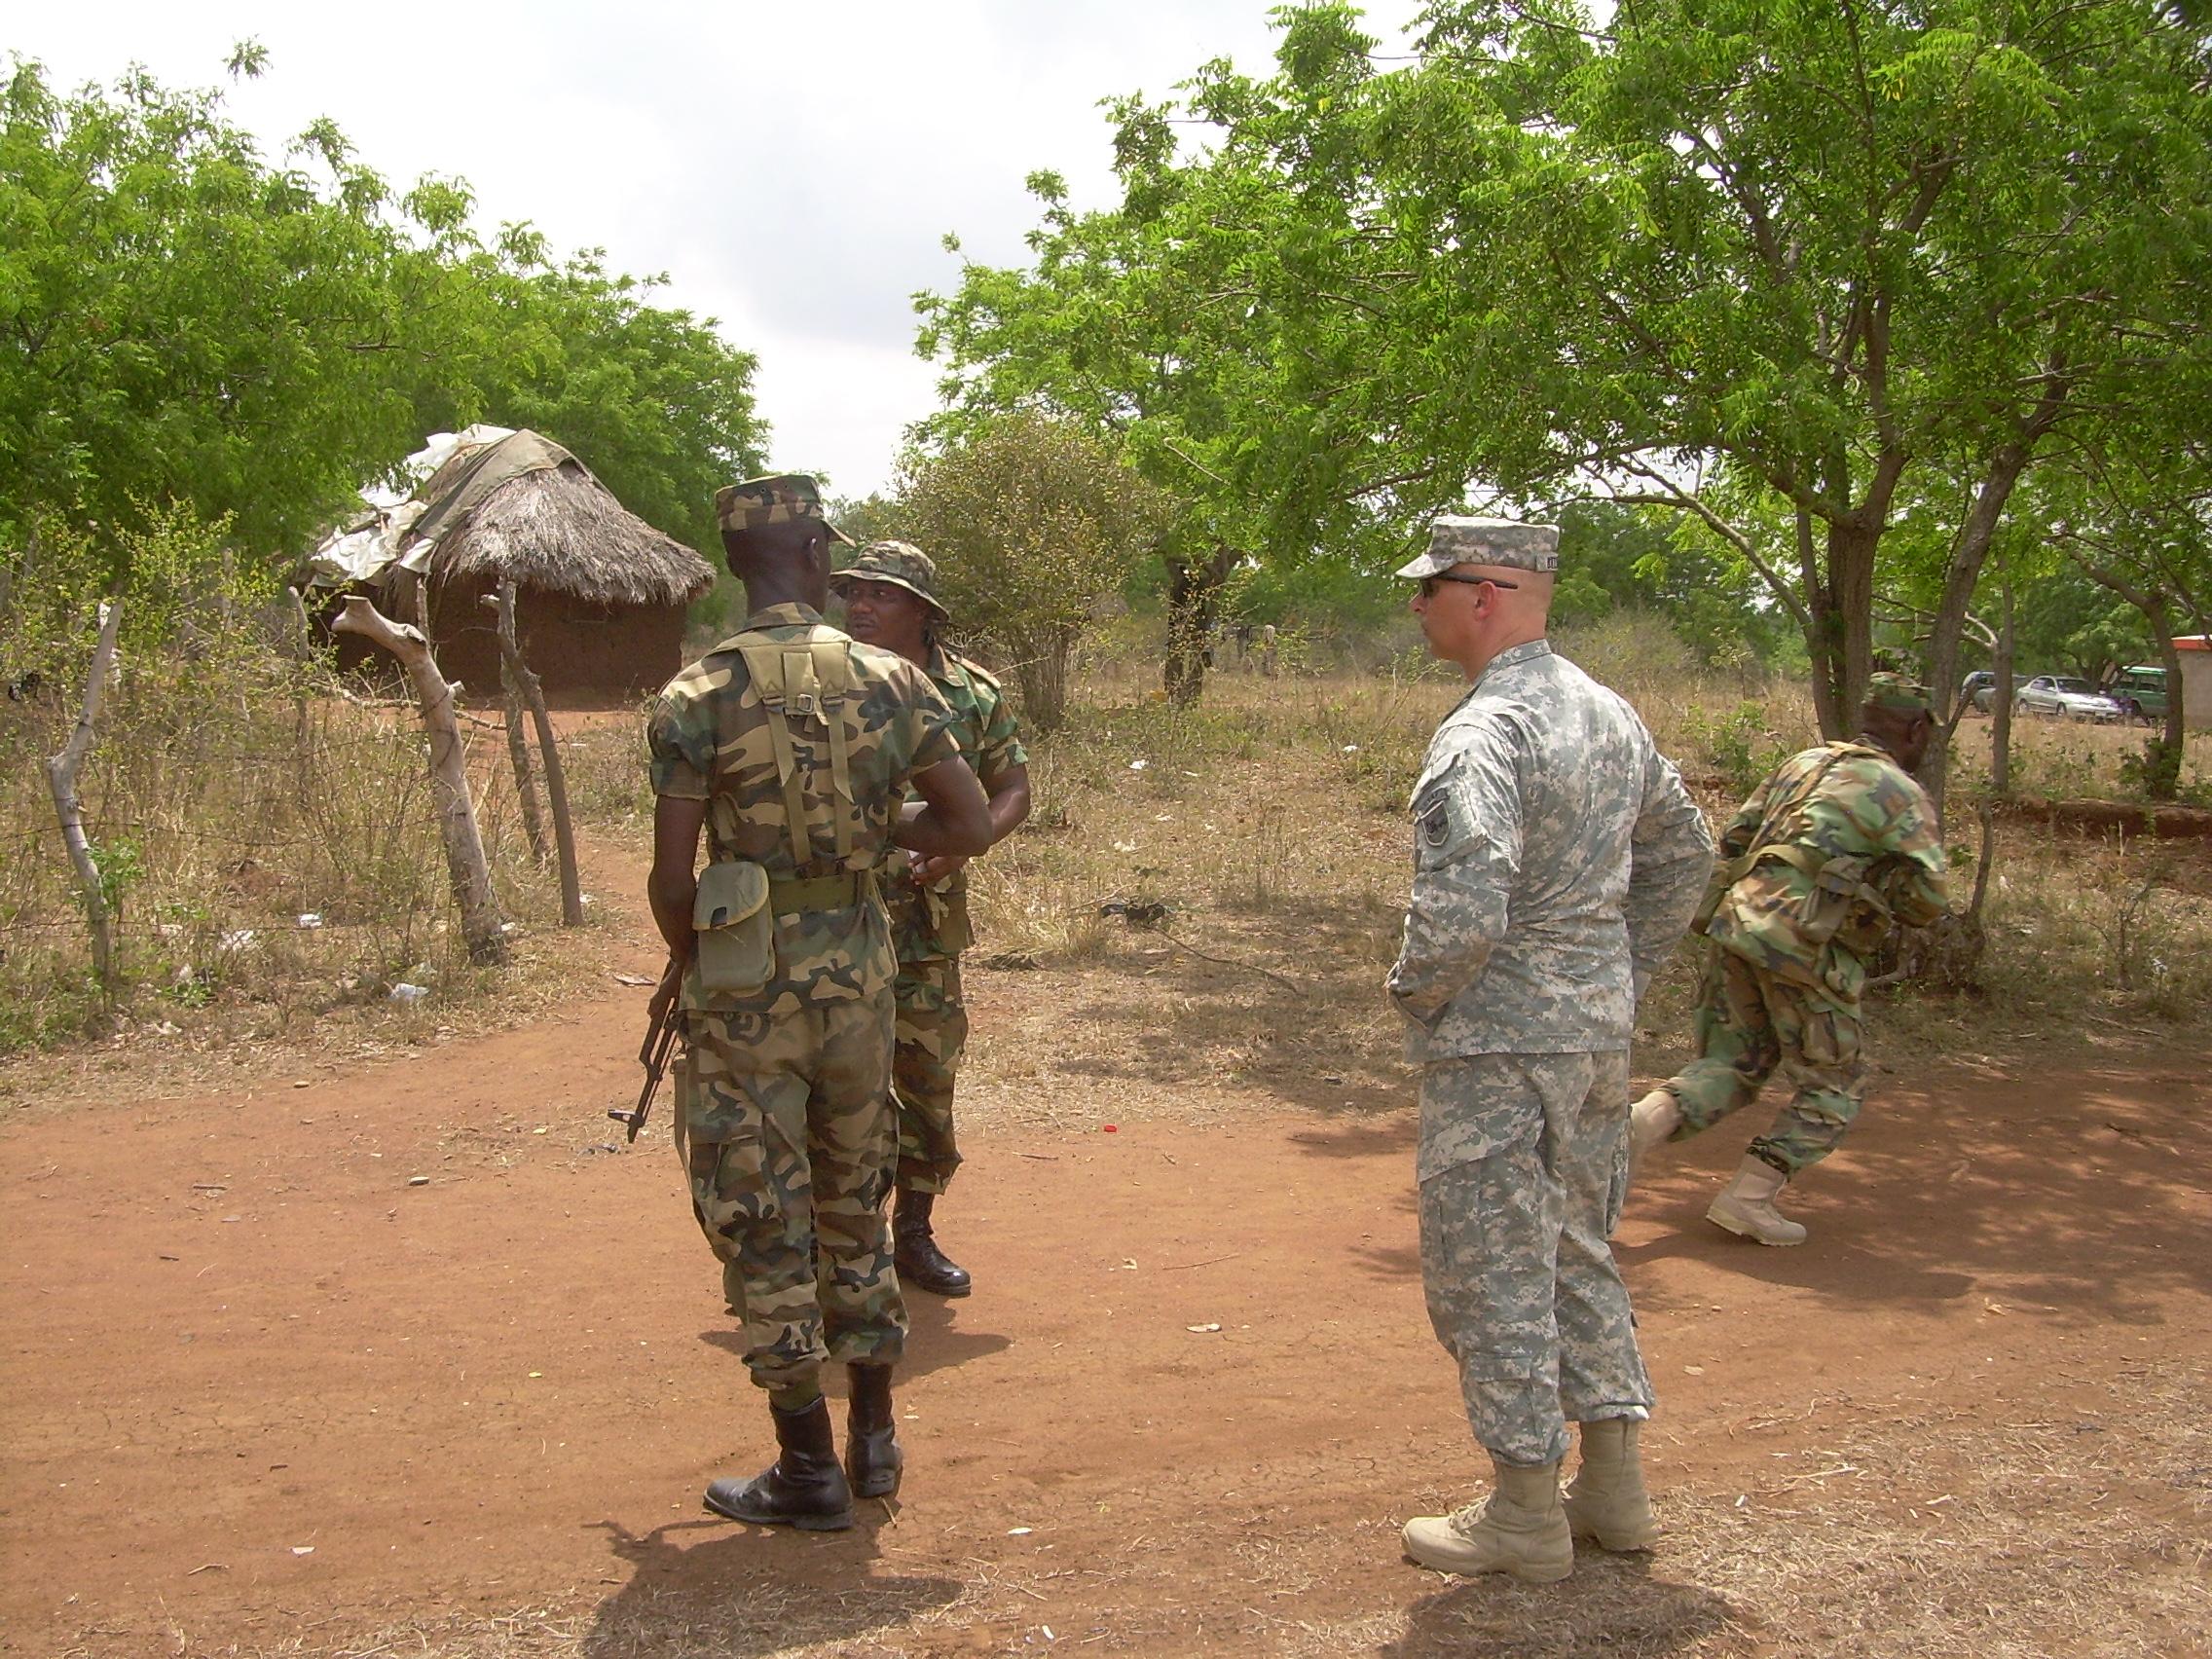 File:U.S. Army Africa 'Train the Trainers' in Ghana 01 ...